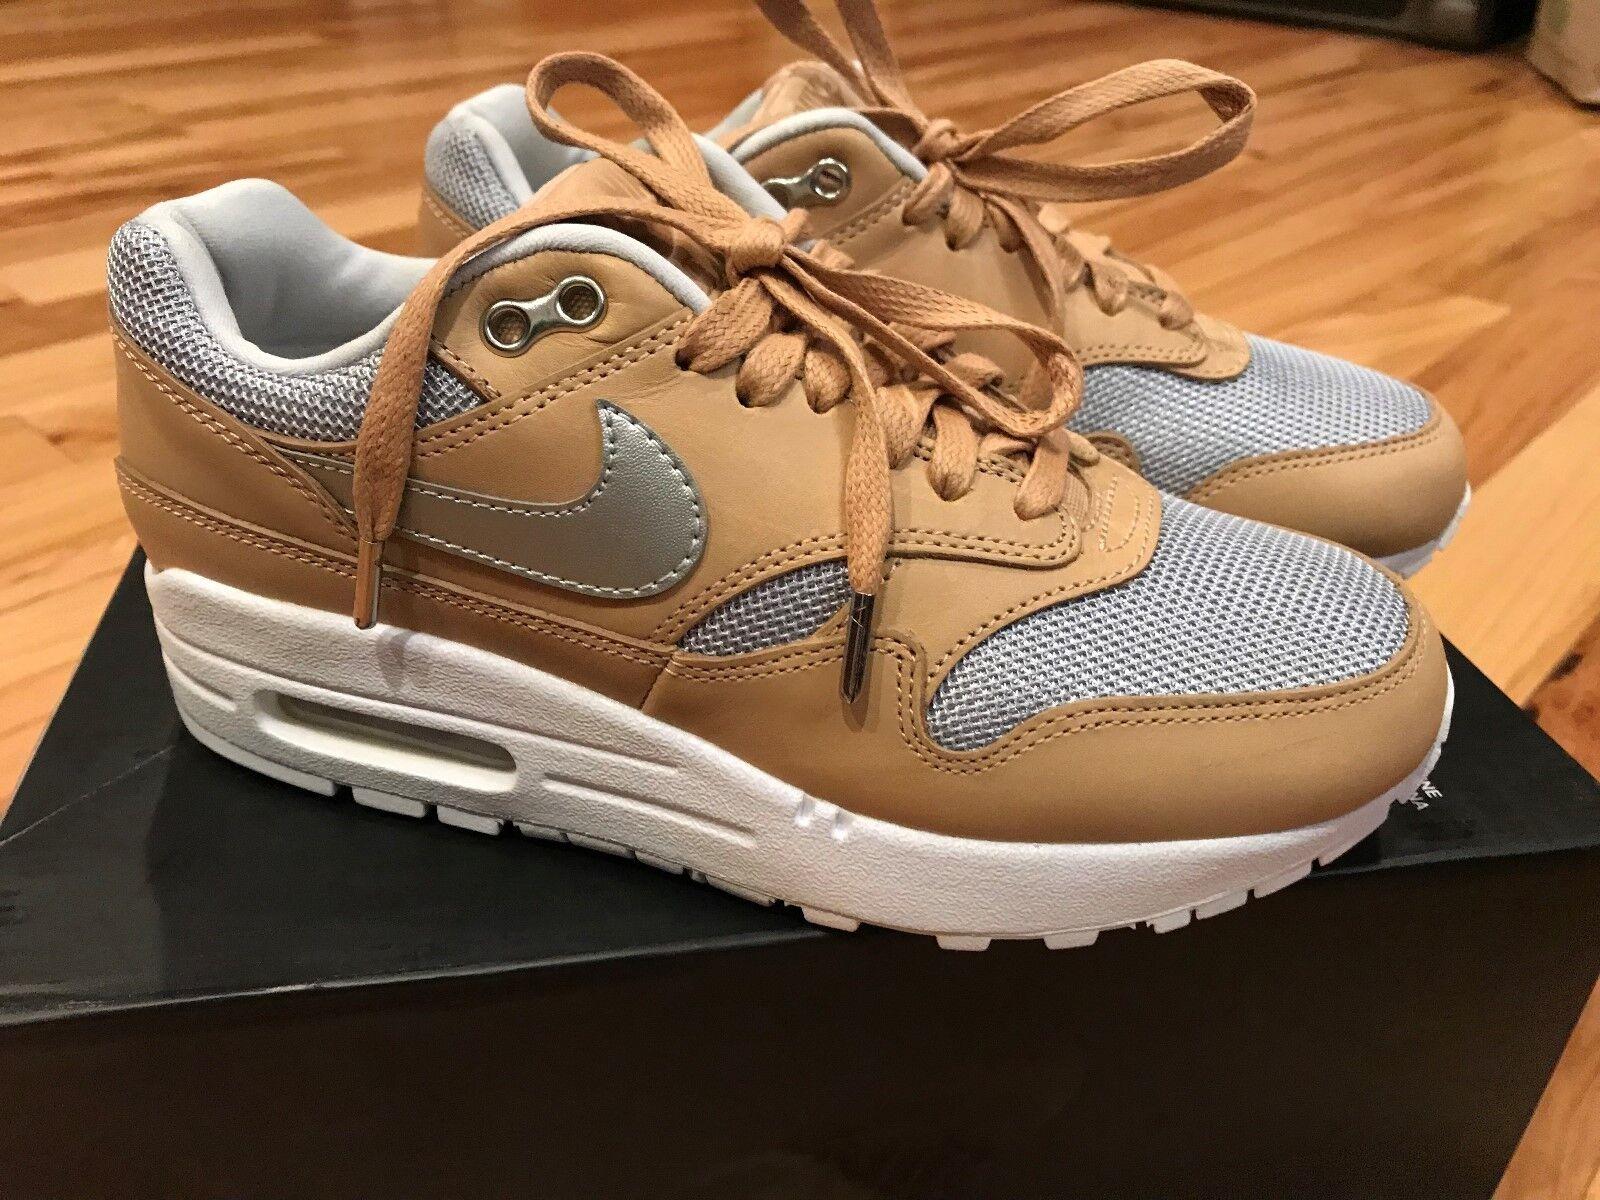 Nike Women's Air Max 1 SE PRM Vachetta Tan Metallic Silver Ao0795 200 Size 5